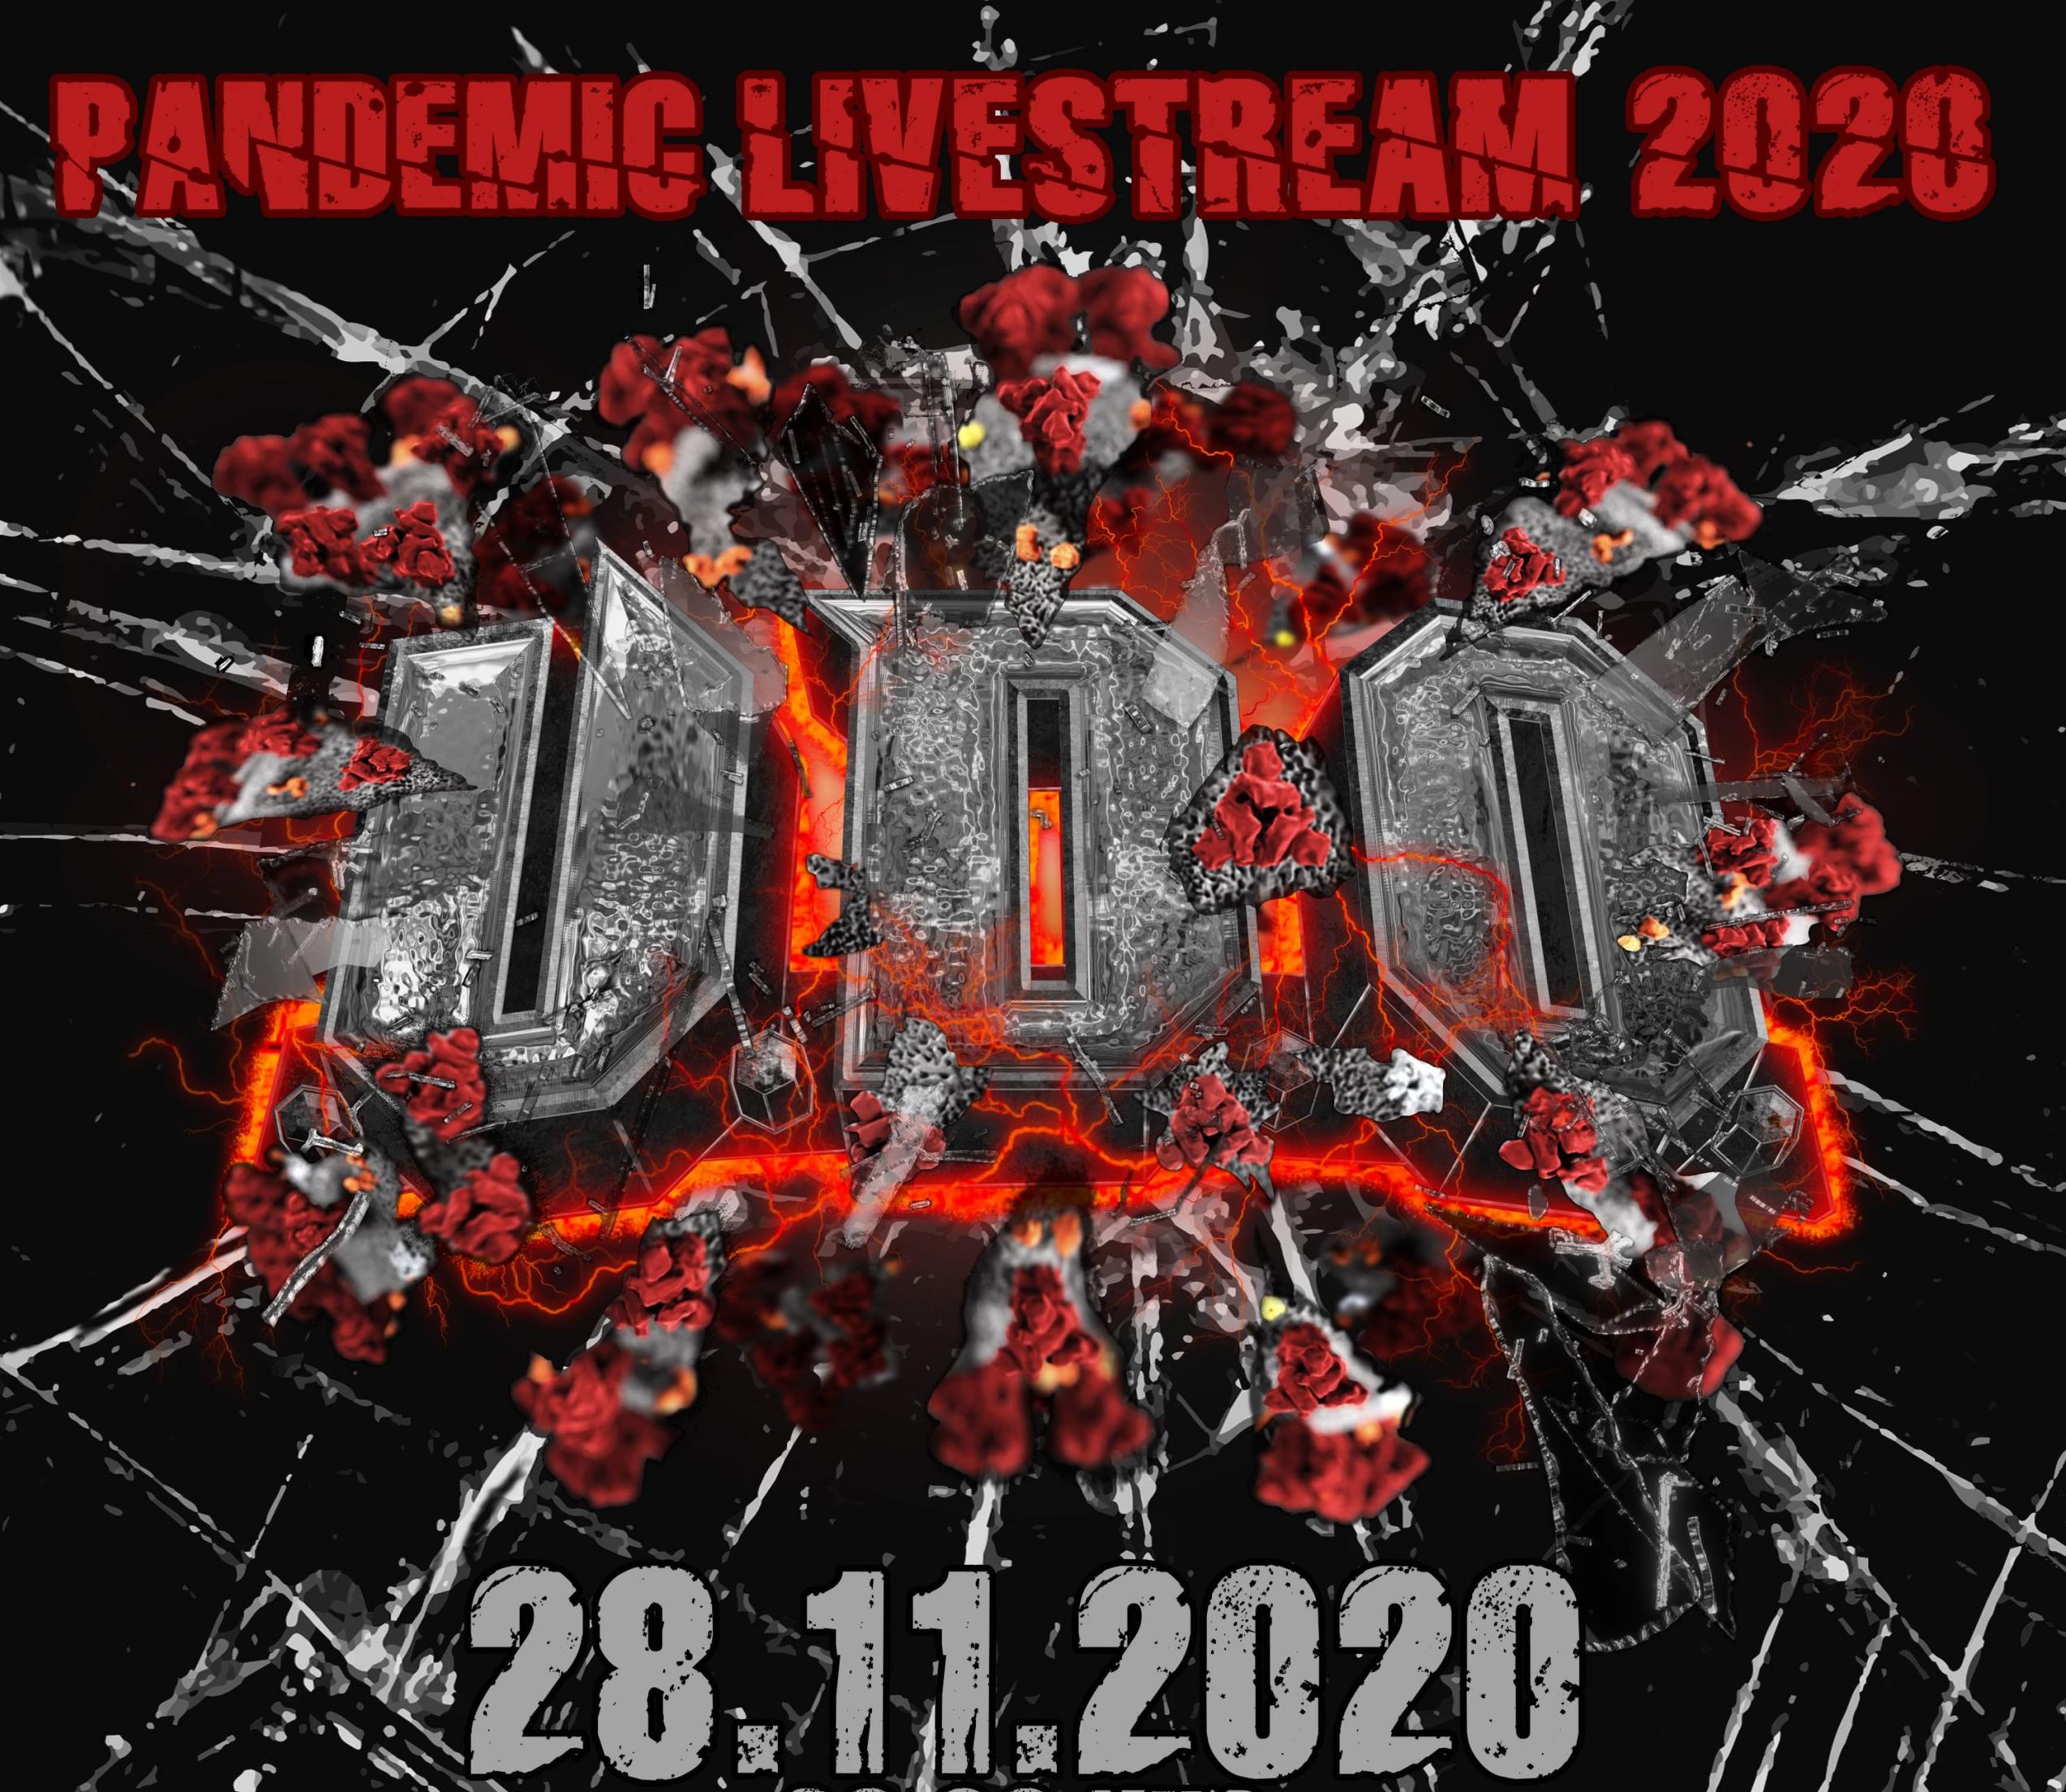 u-d-o-review-zum-pandemic-livestream-aus-dem-7er-club-in-mannheim